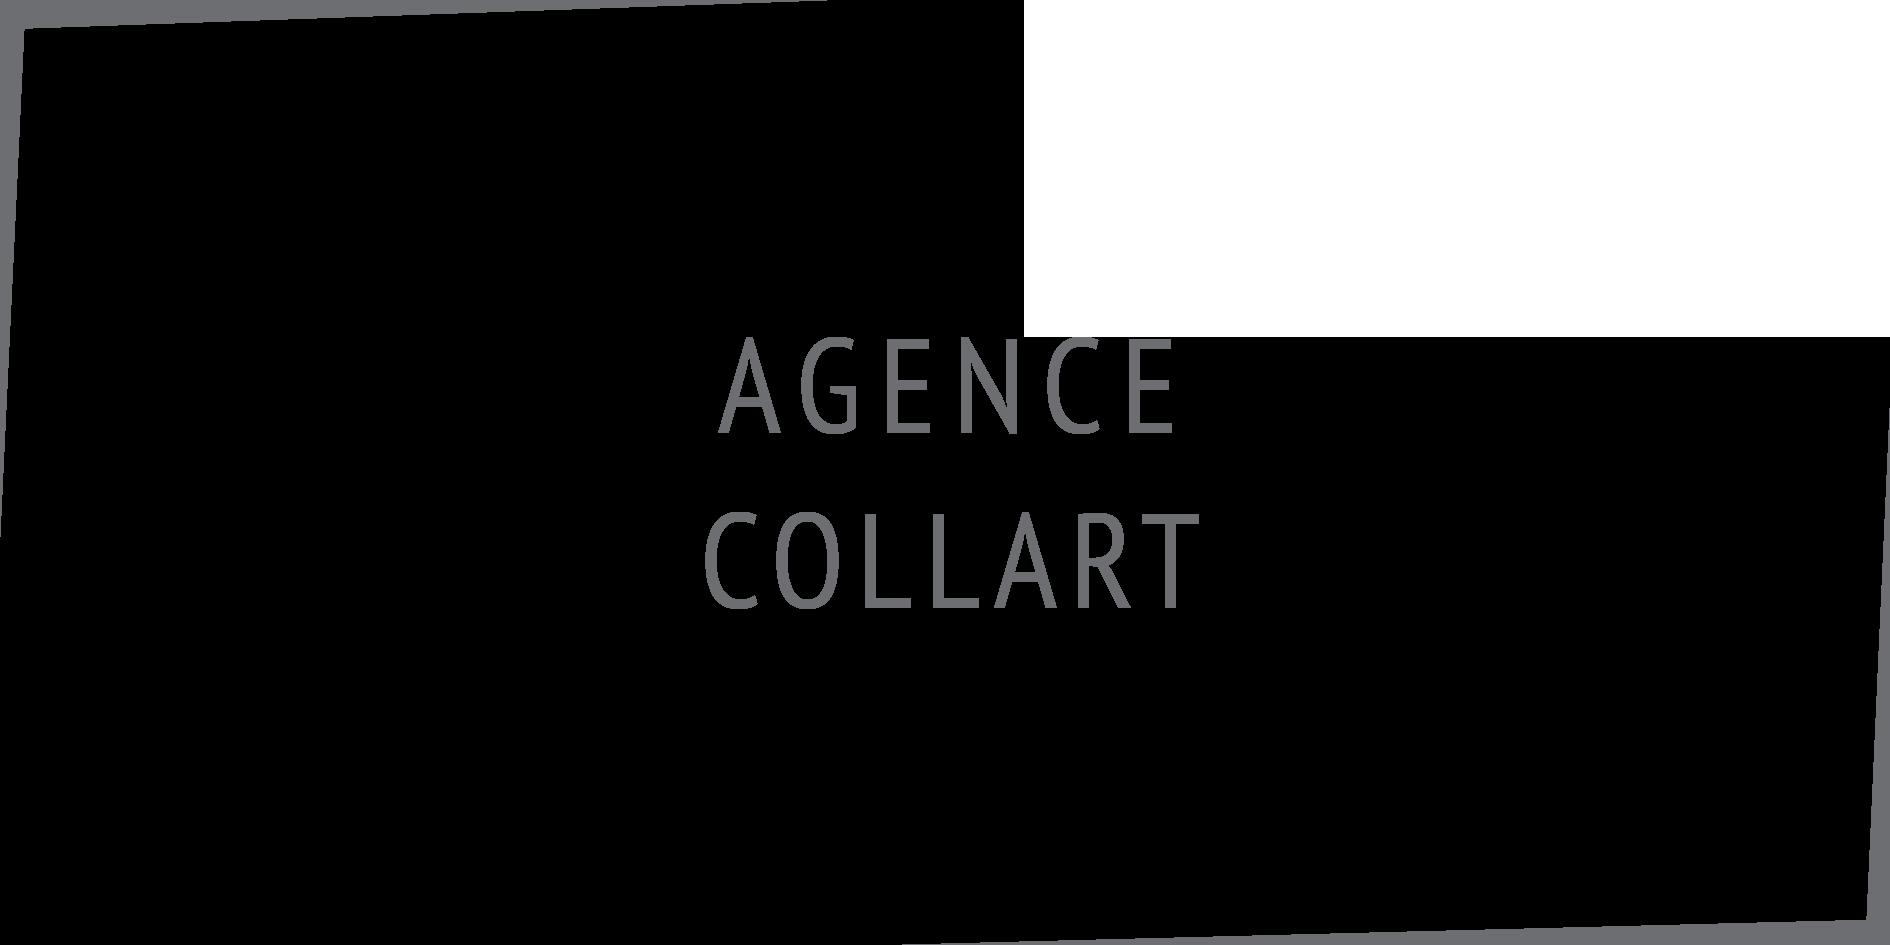 CLIQ agences-collart Pano